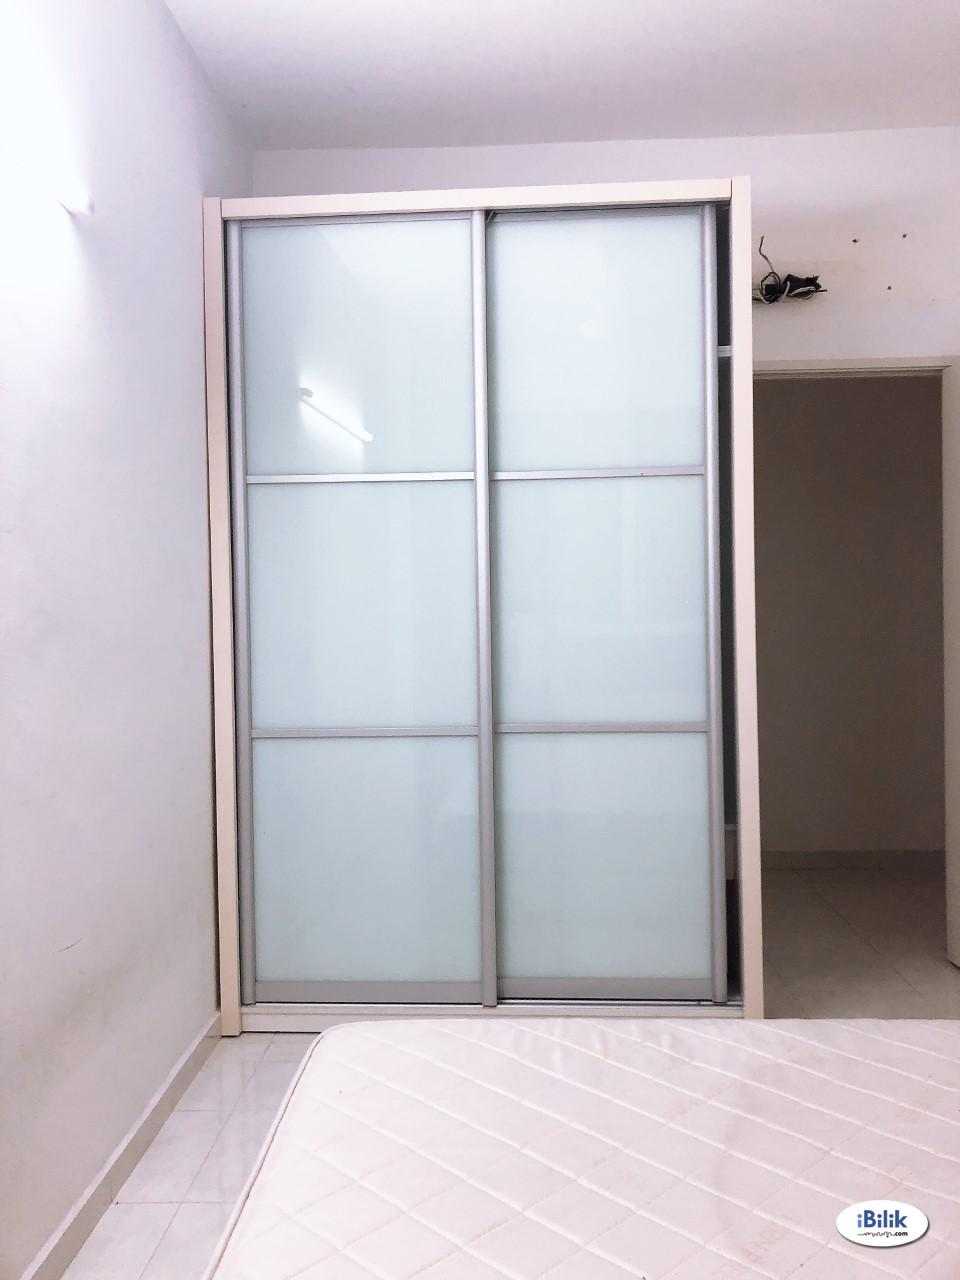 Seaview Middle Room at Karpal Singh, Penang